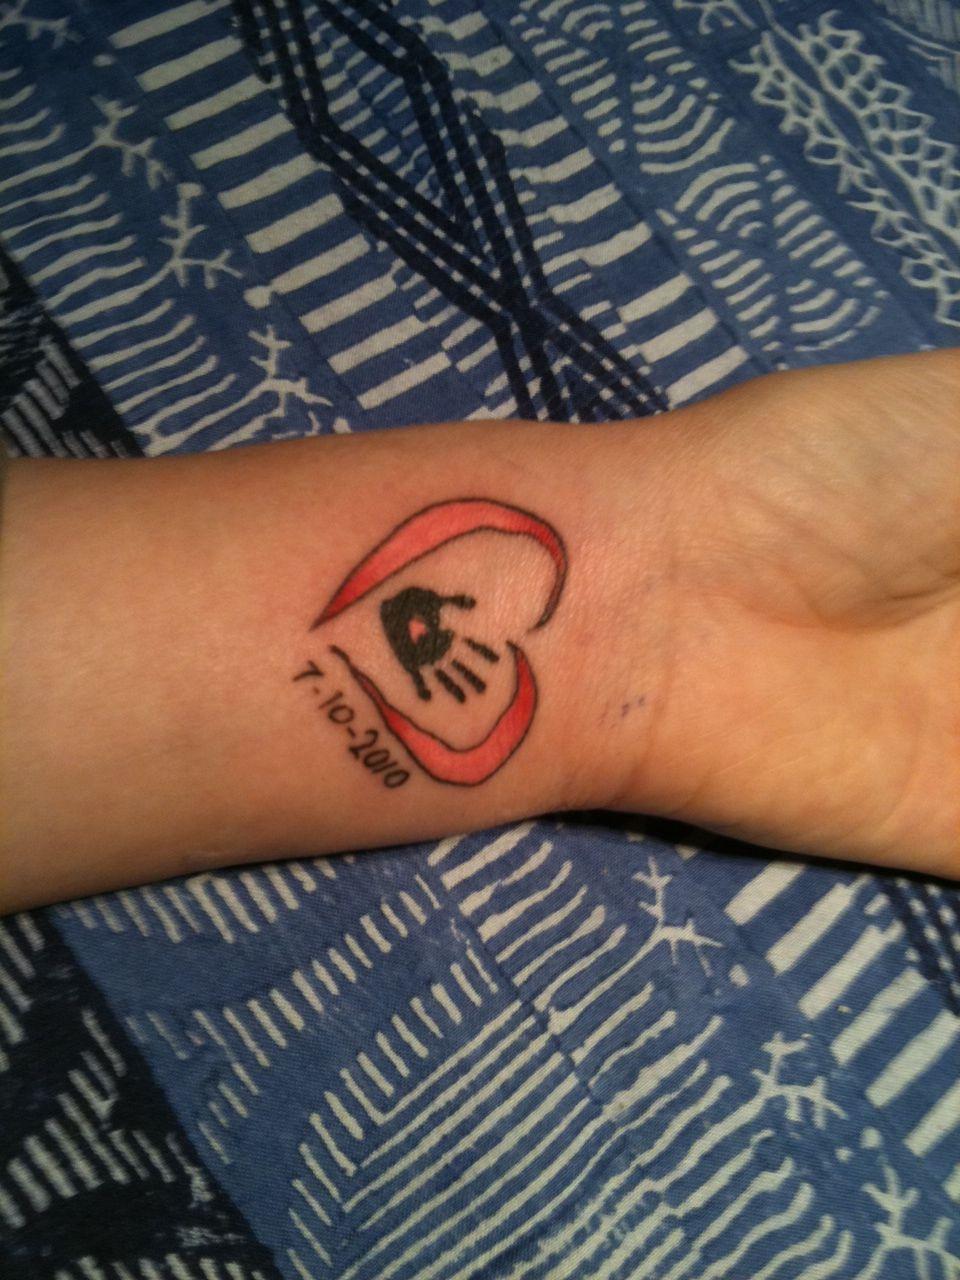 healing hand tattoos like the idea of a child's hand